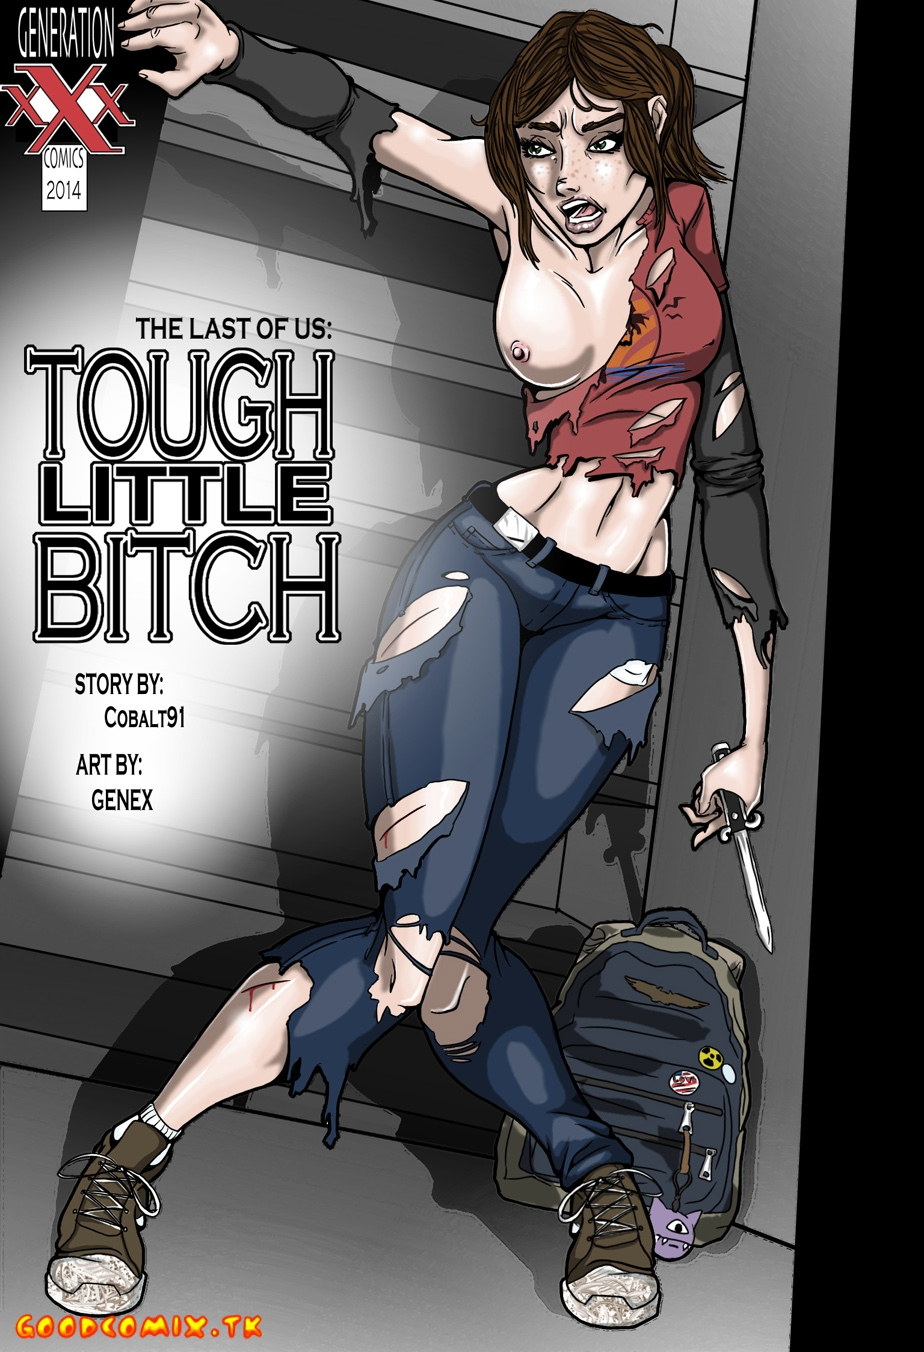 Goodcomix.tk The Last of Us - [Genex] - Tough Little Bitch